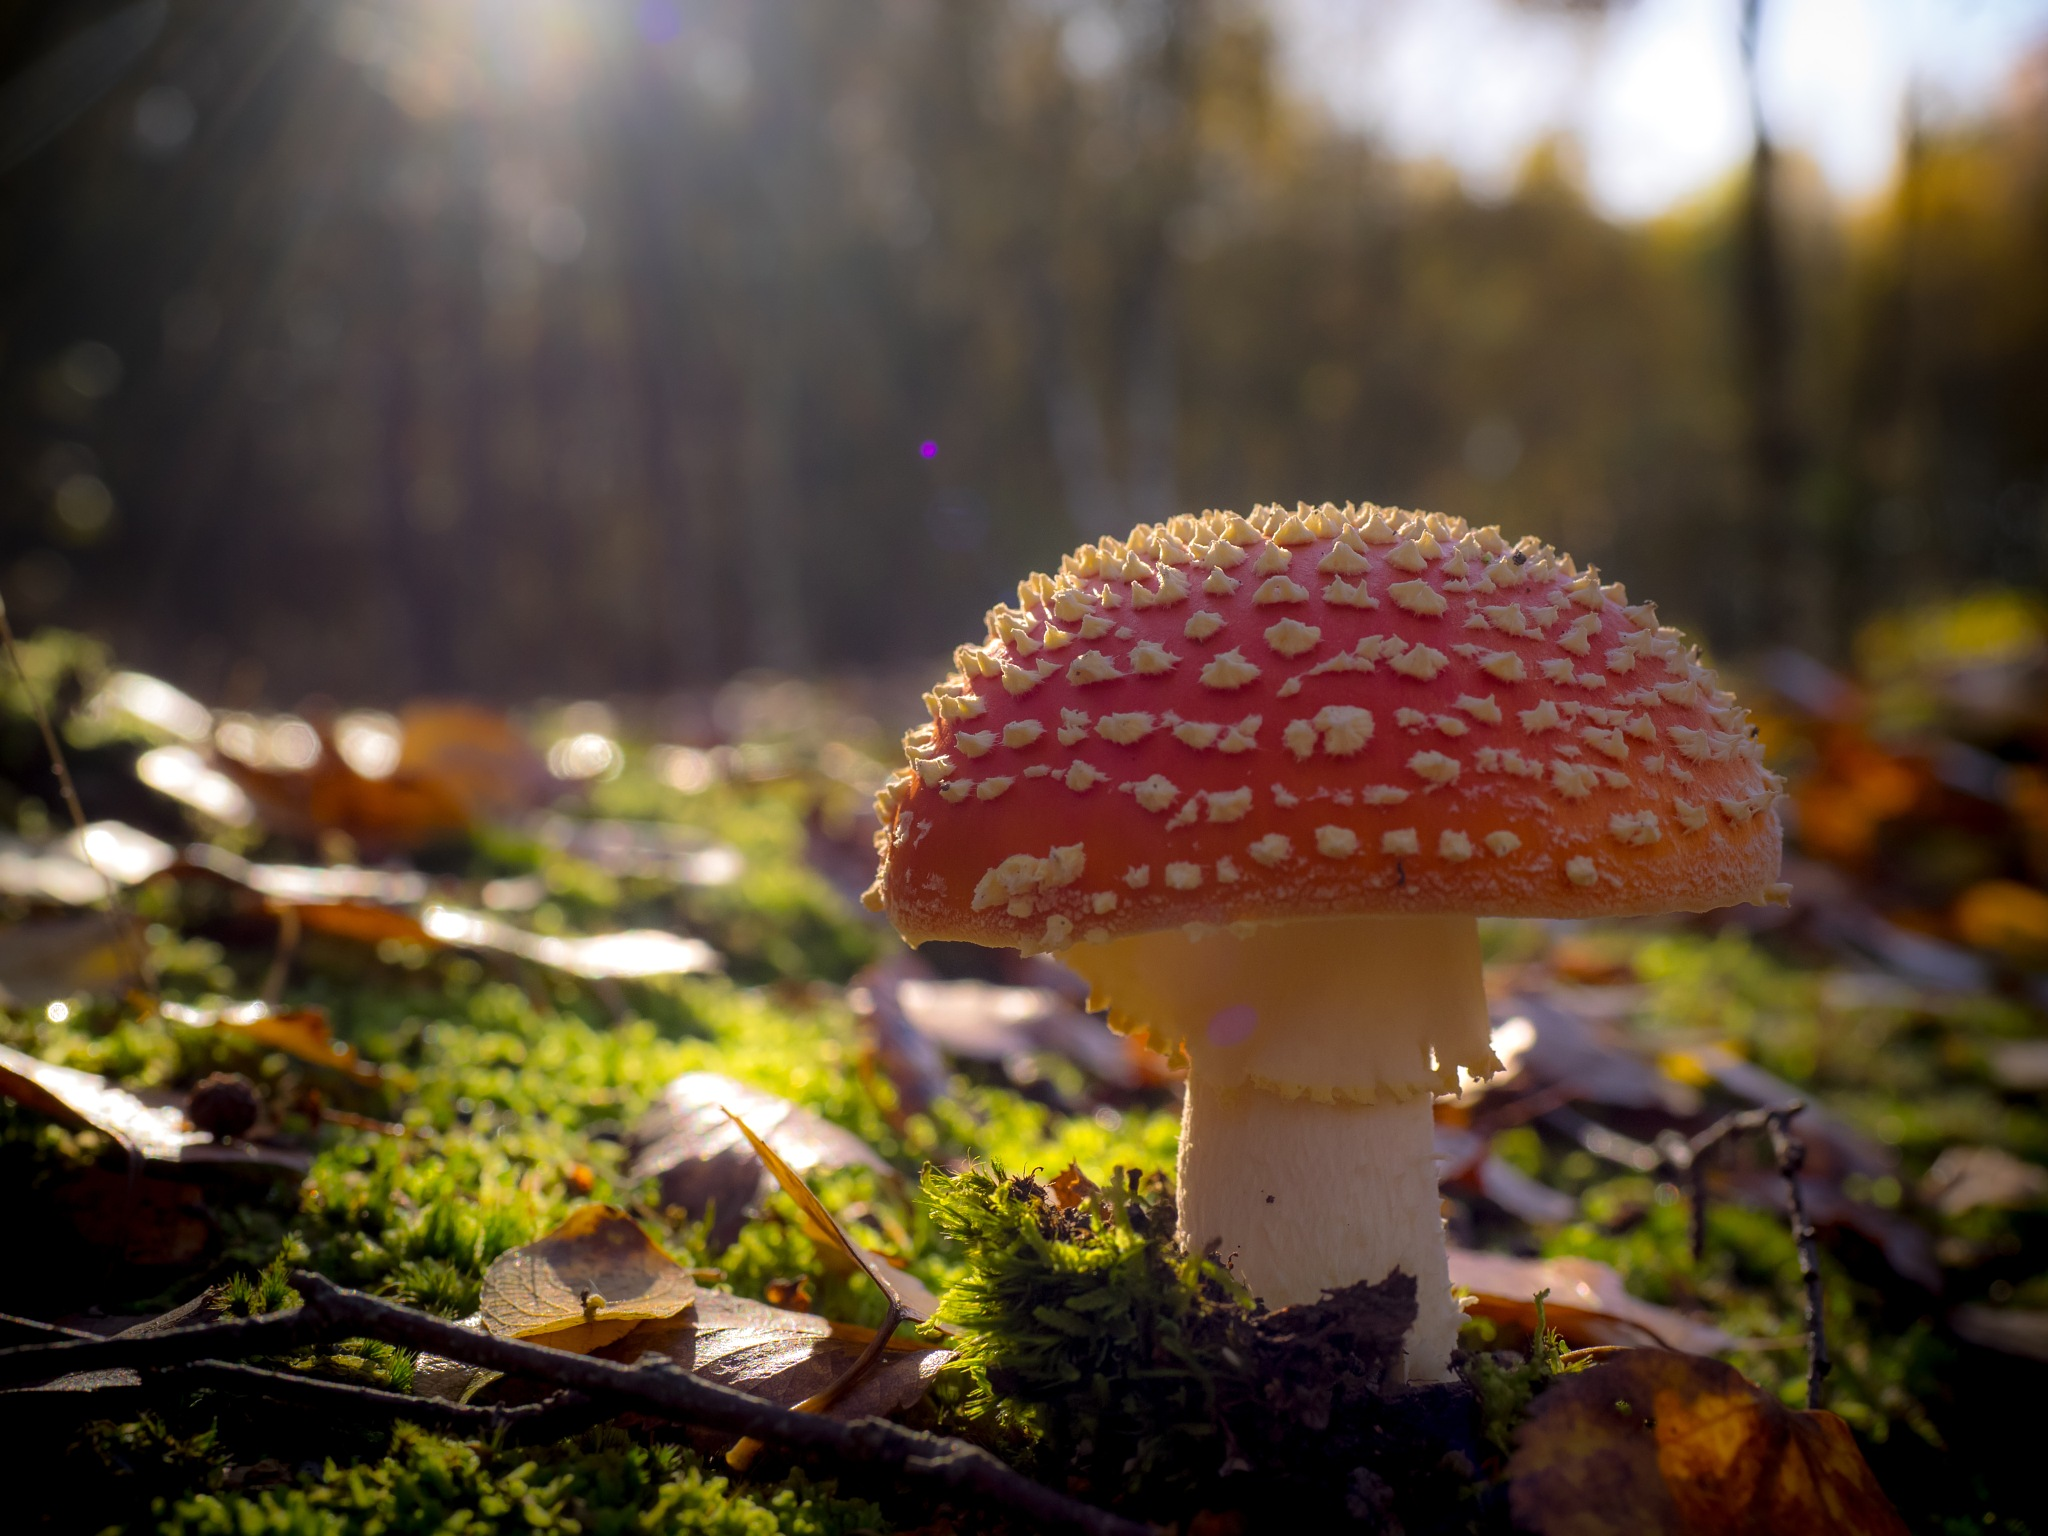 Magical Fungi by Sarah Walters